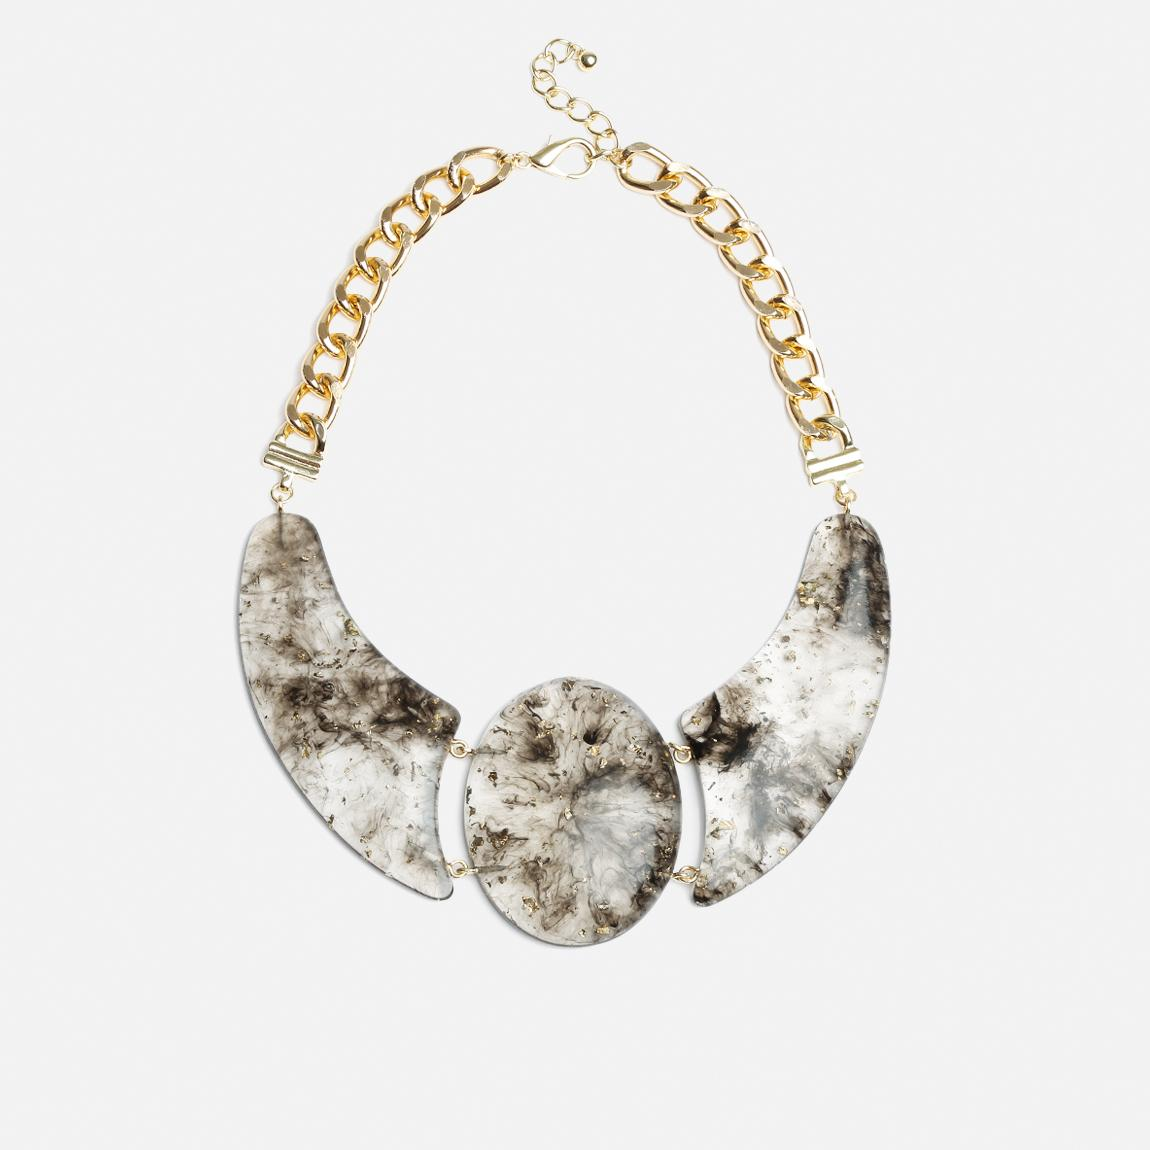 lulie necklace gold vero moda jewellery superbalistcom